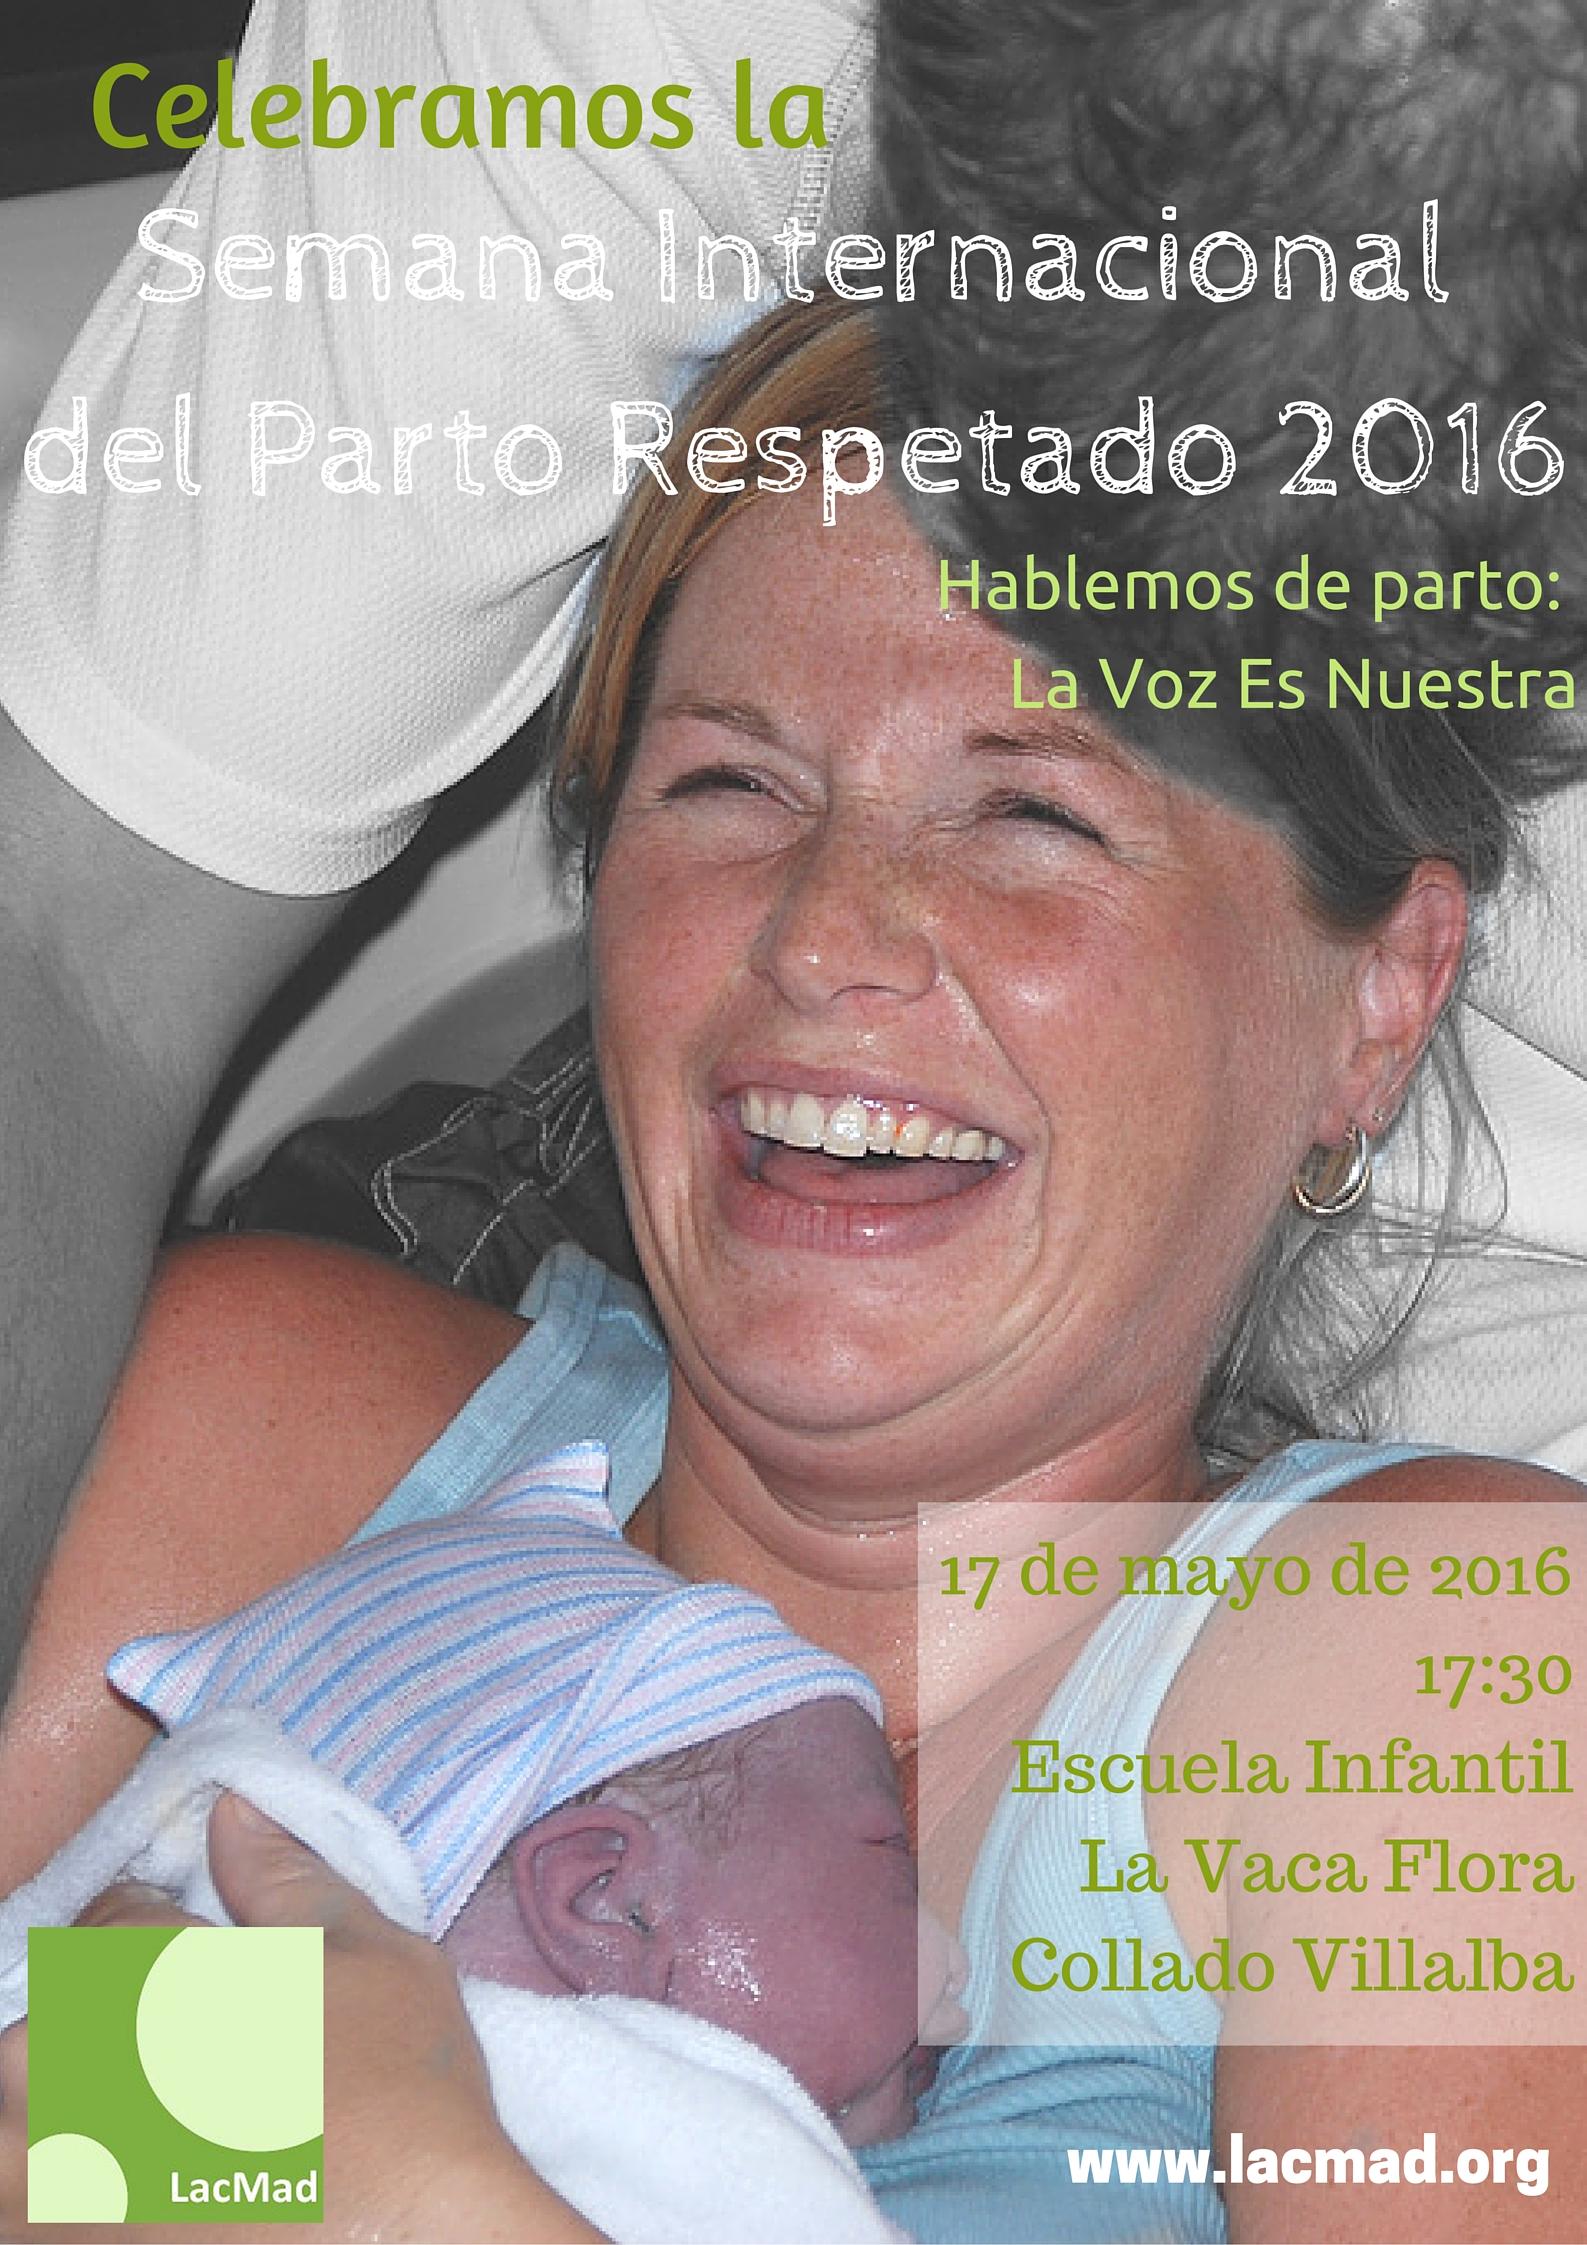 Semana Internacional Parto Respetado 2016